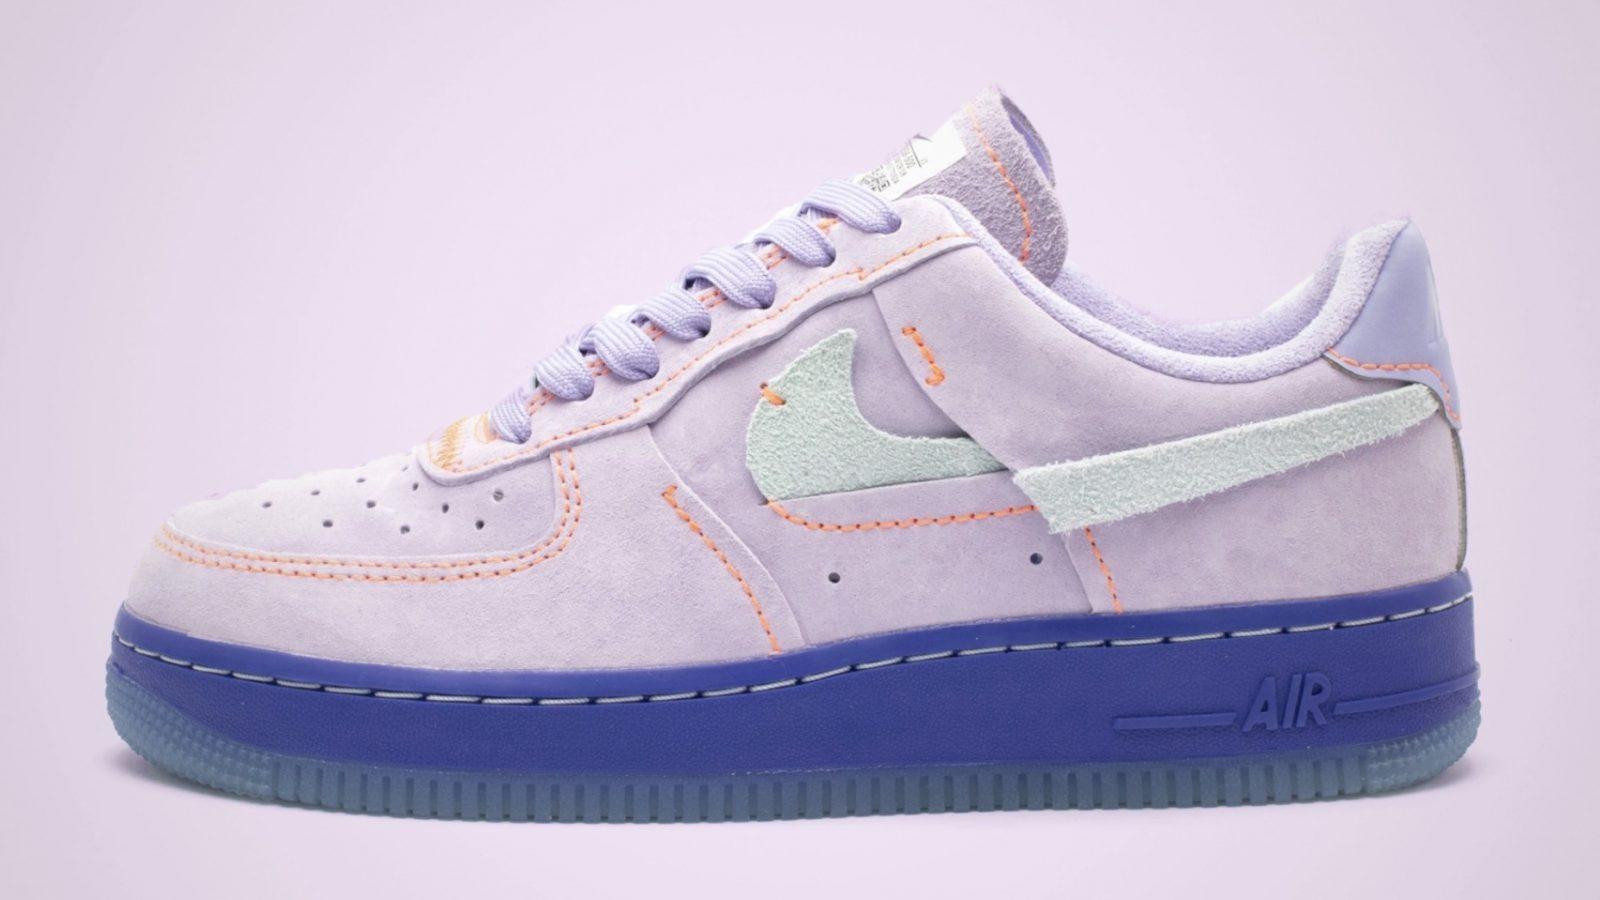 The Colourful Air Force Overhaul A Vandalised Gets Nike 1 XwZ0PNn8Ok